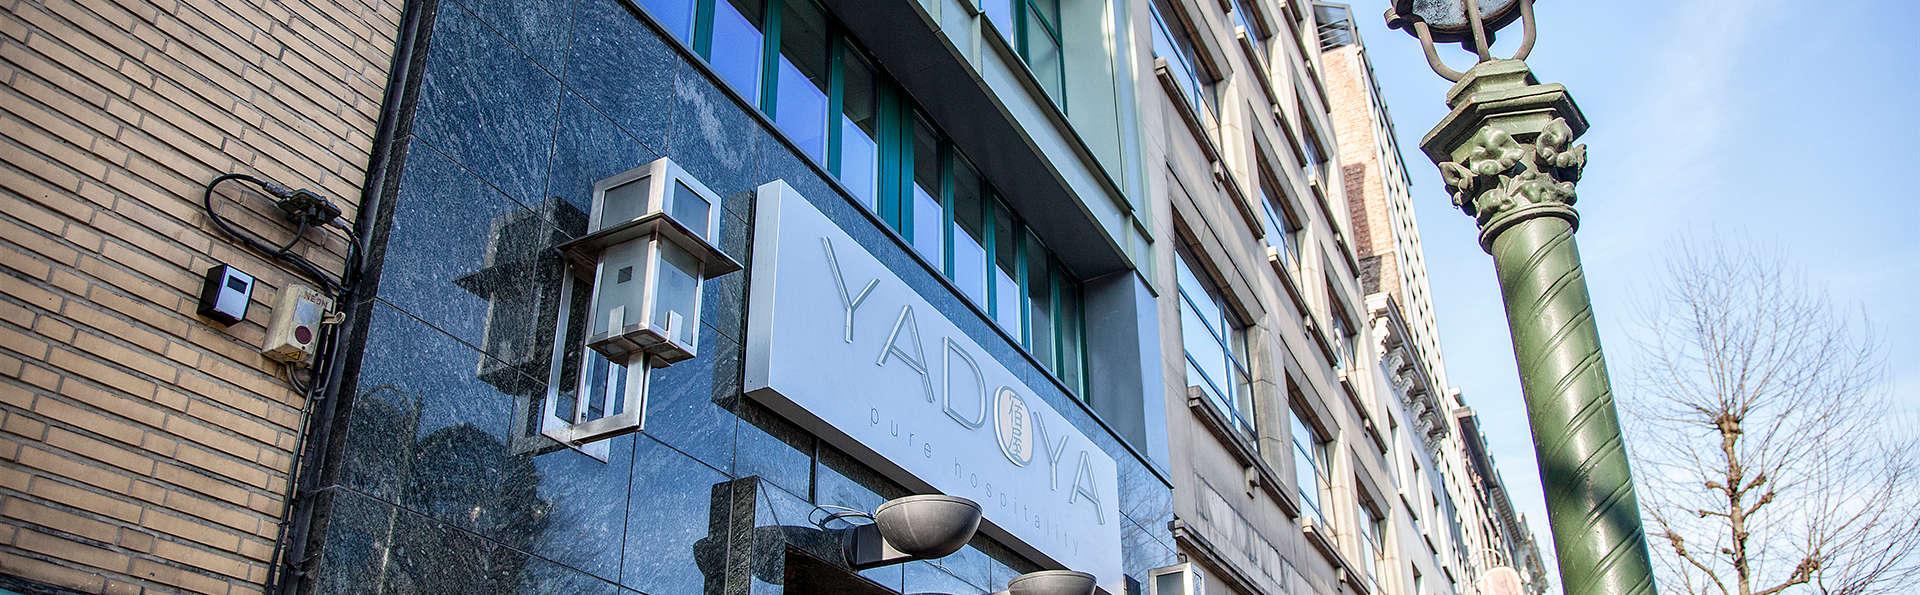 Yadoya Hotel - Edit_Front2.jpg